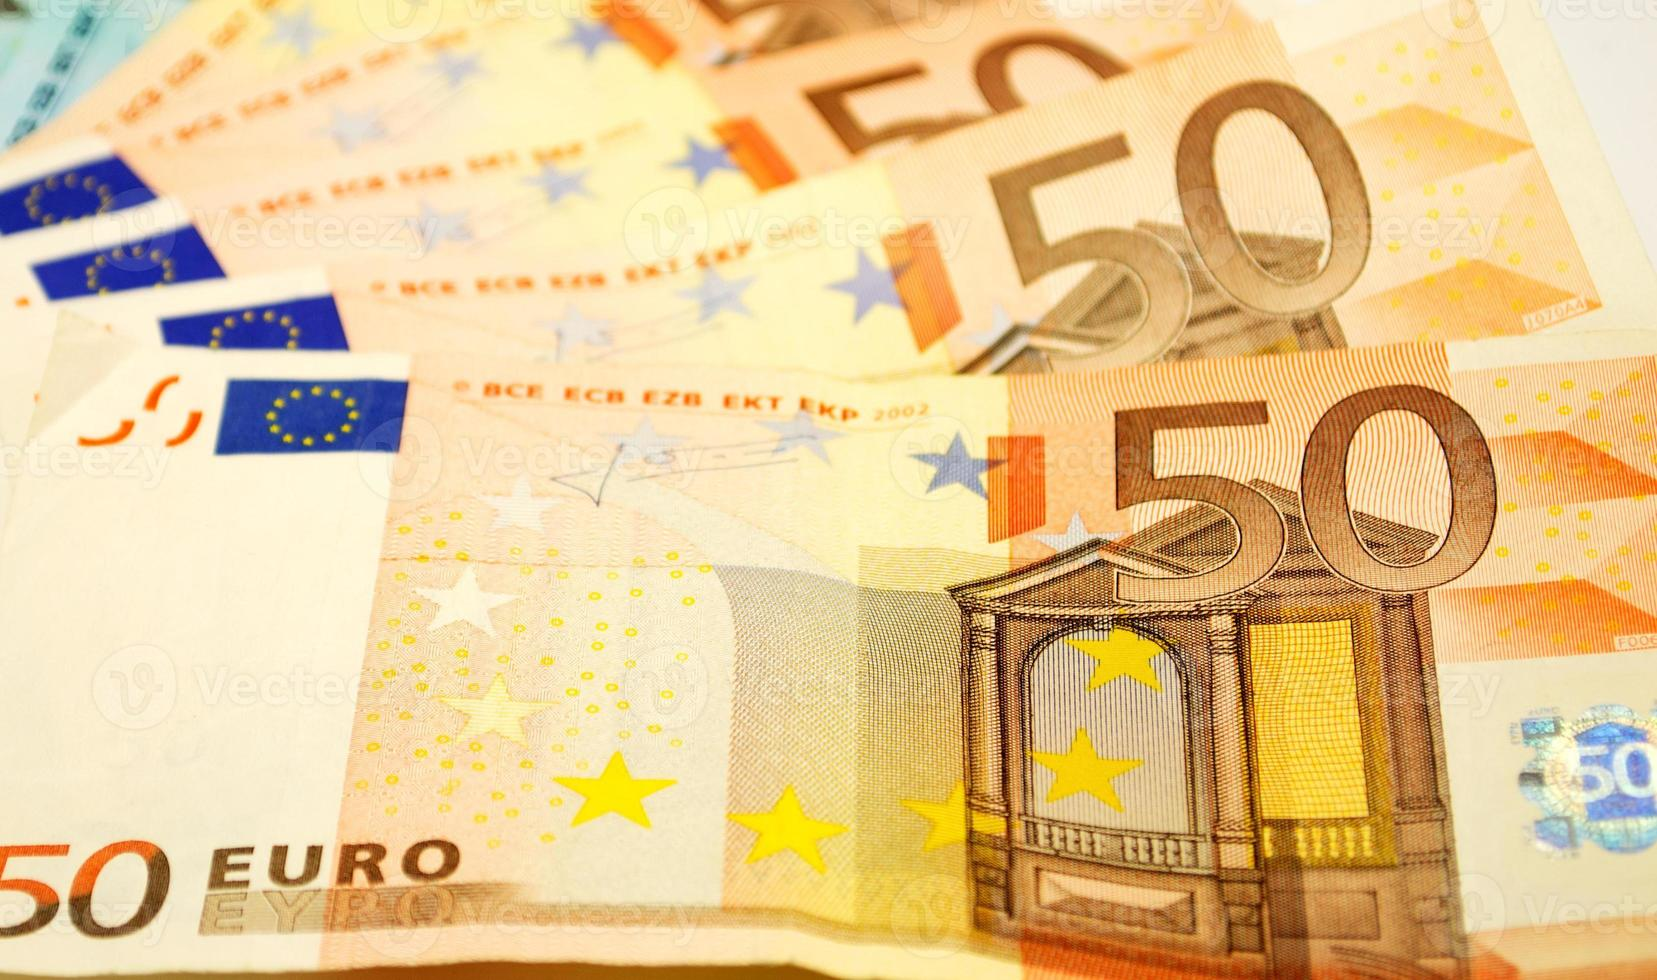 euro bills close up photo